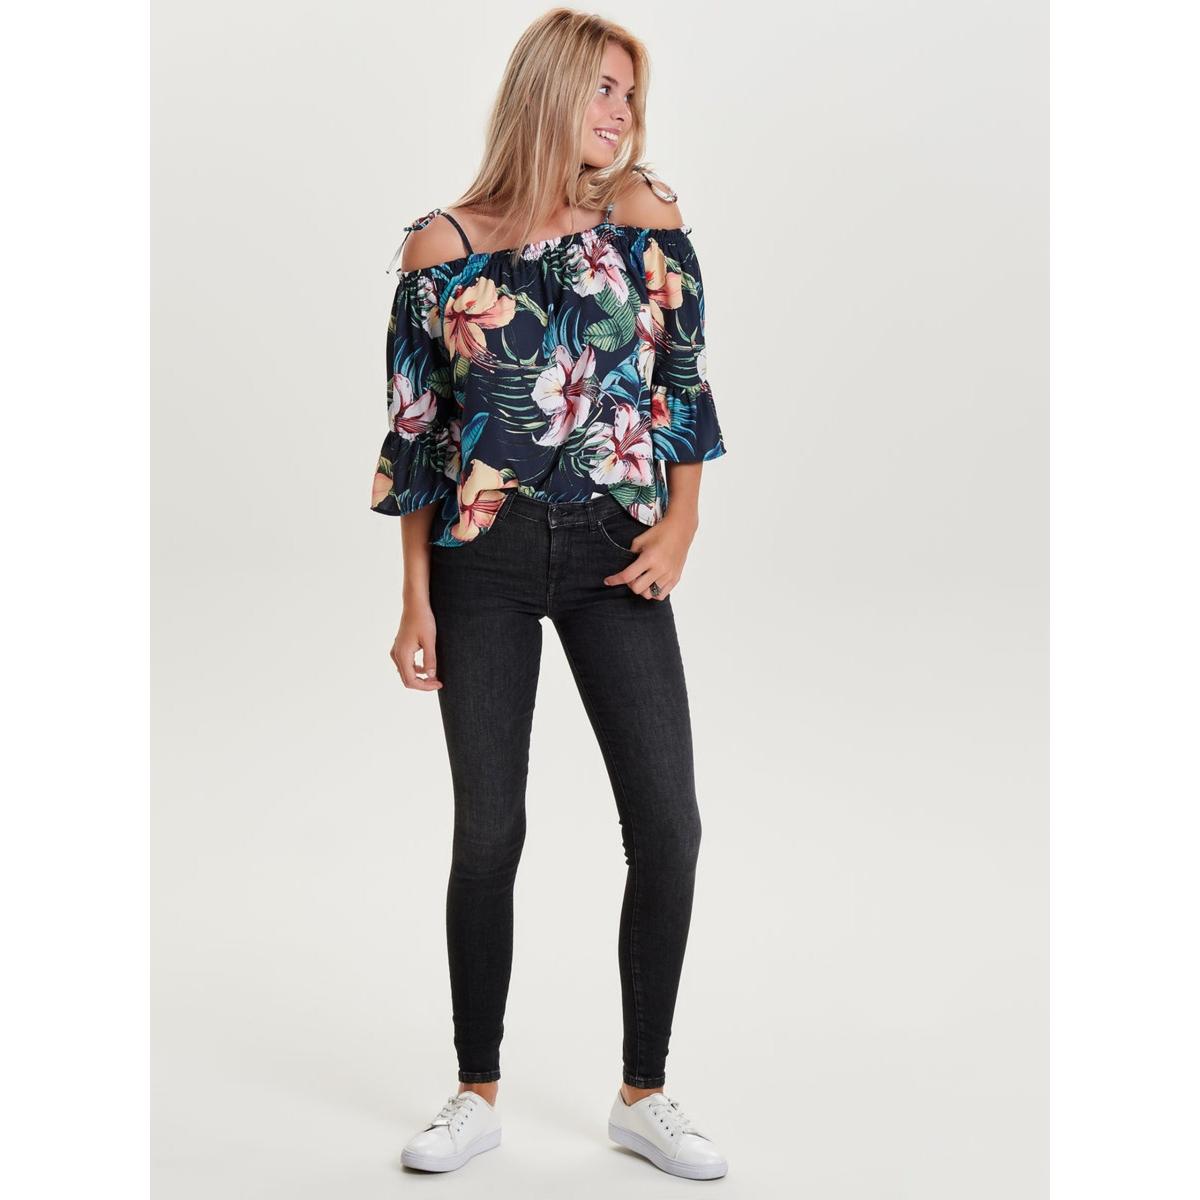 onlshape deluxe dnm jeans rea18001 noos 15138726 only jeans black